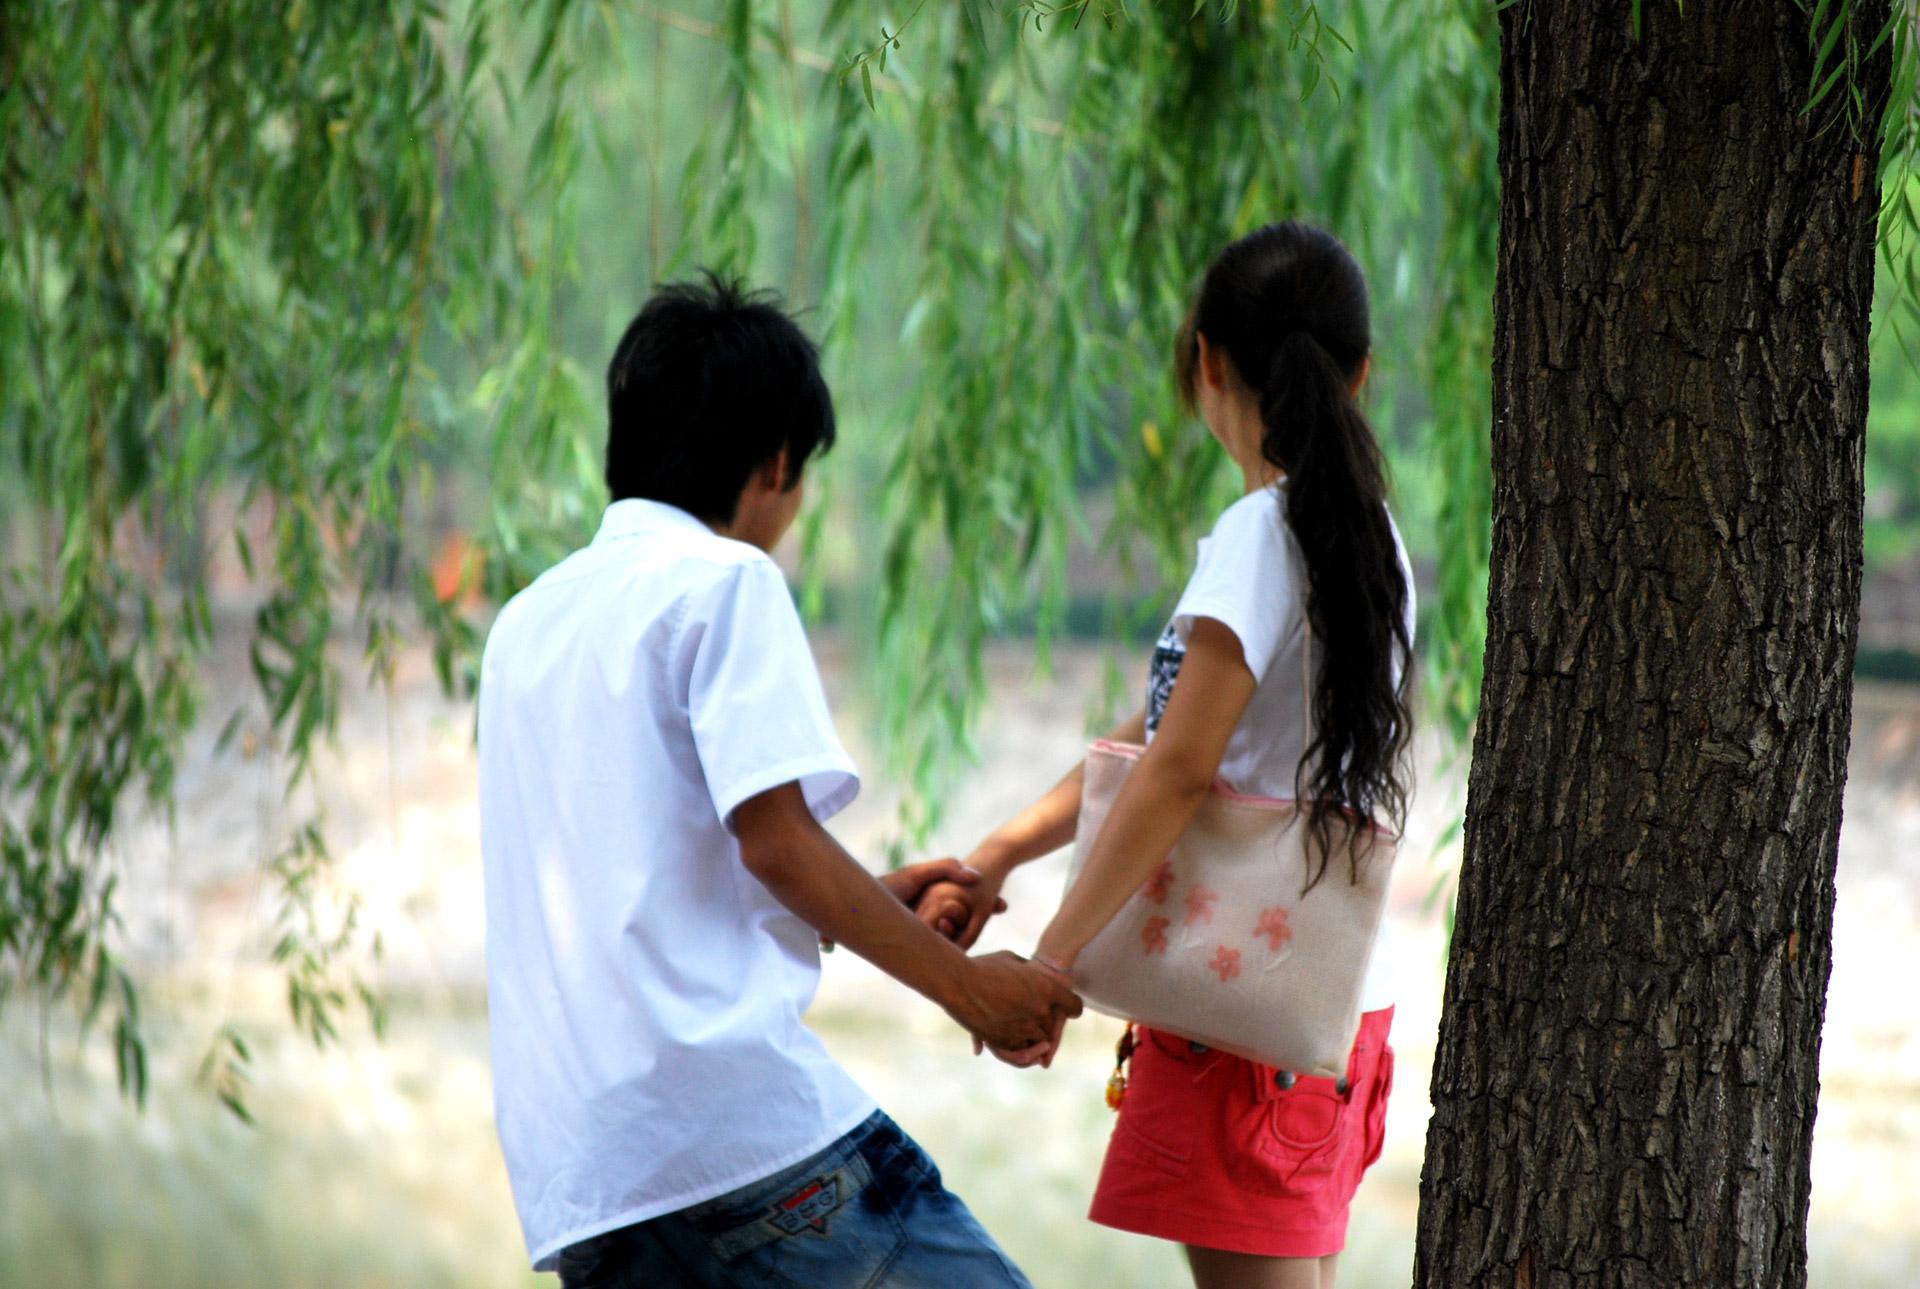 kaip paleisti mylima zmogu